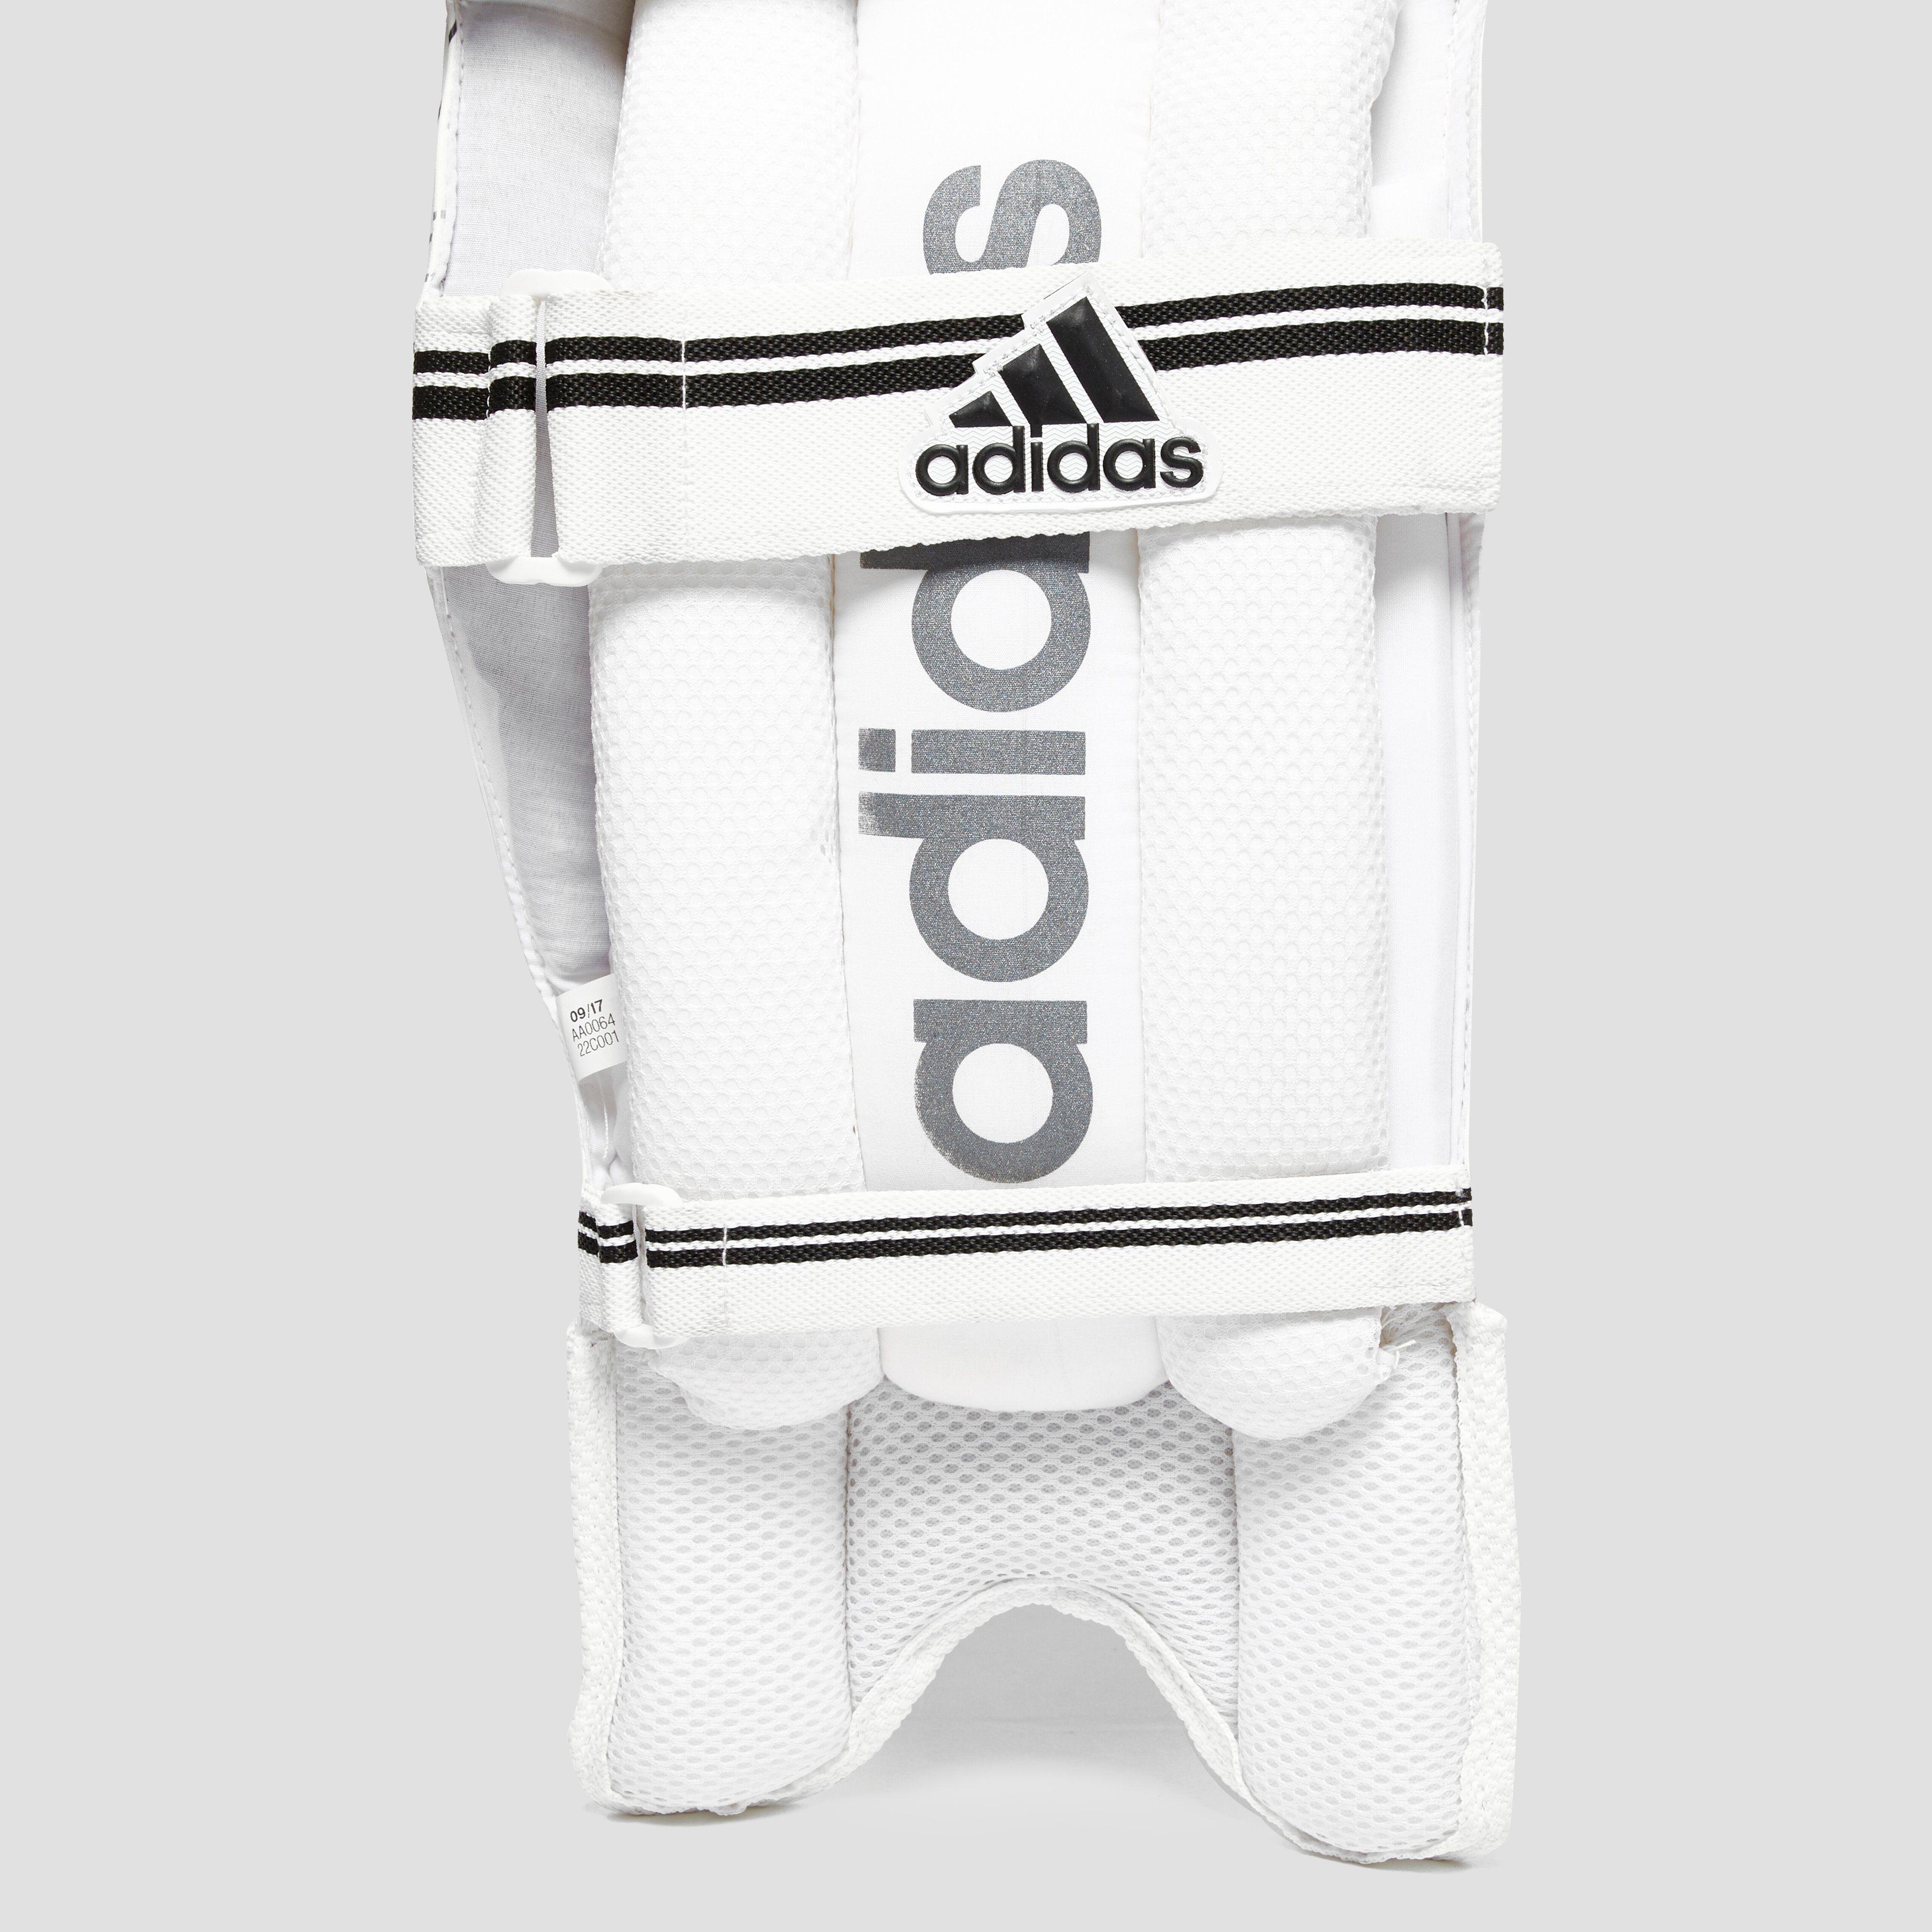 adidas Xt 4.0 Junior Batting Pads